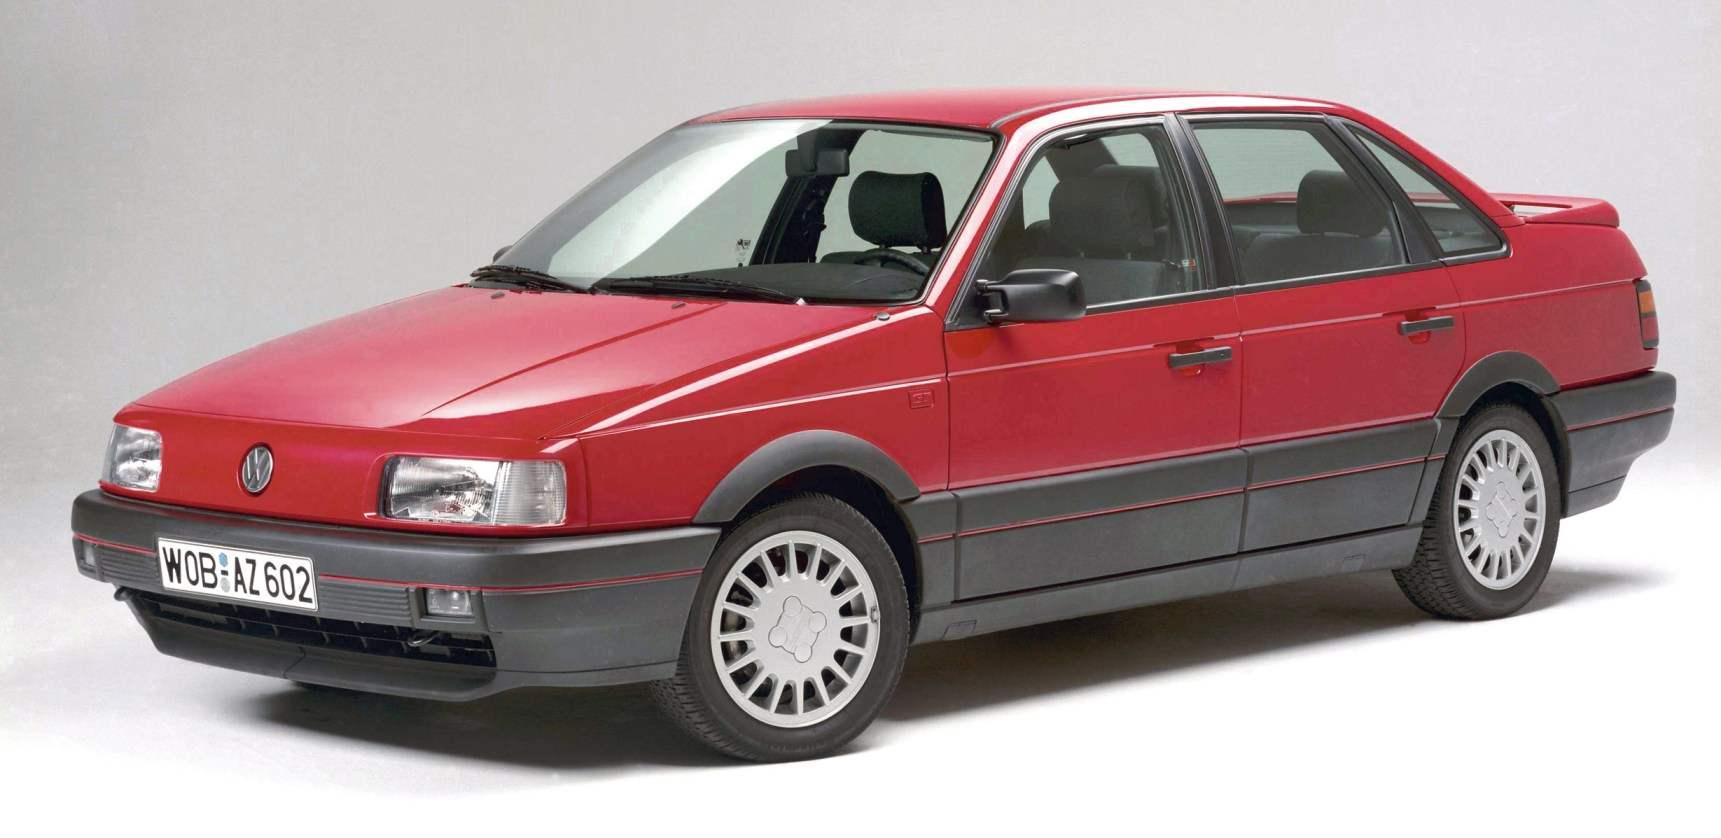 VW PASSAT third generation (1988)